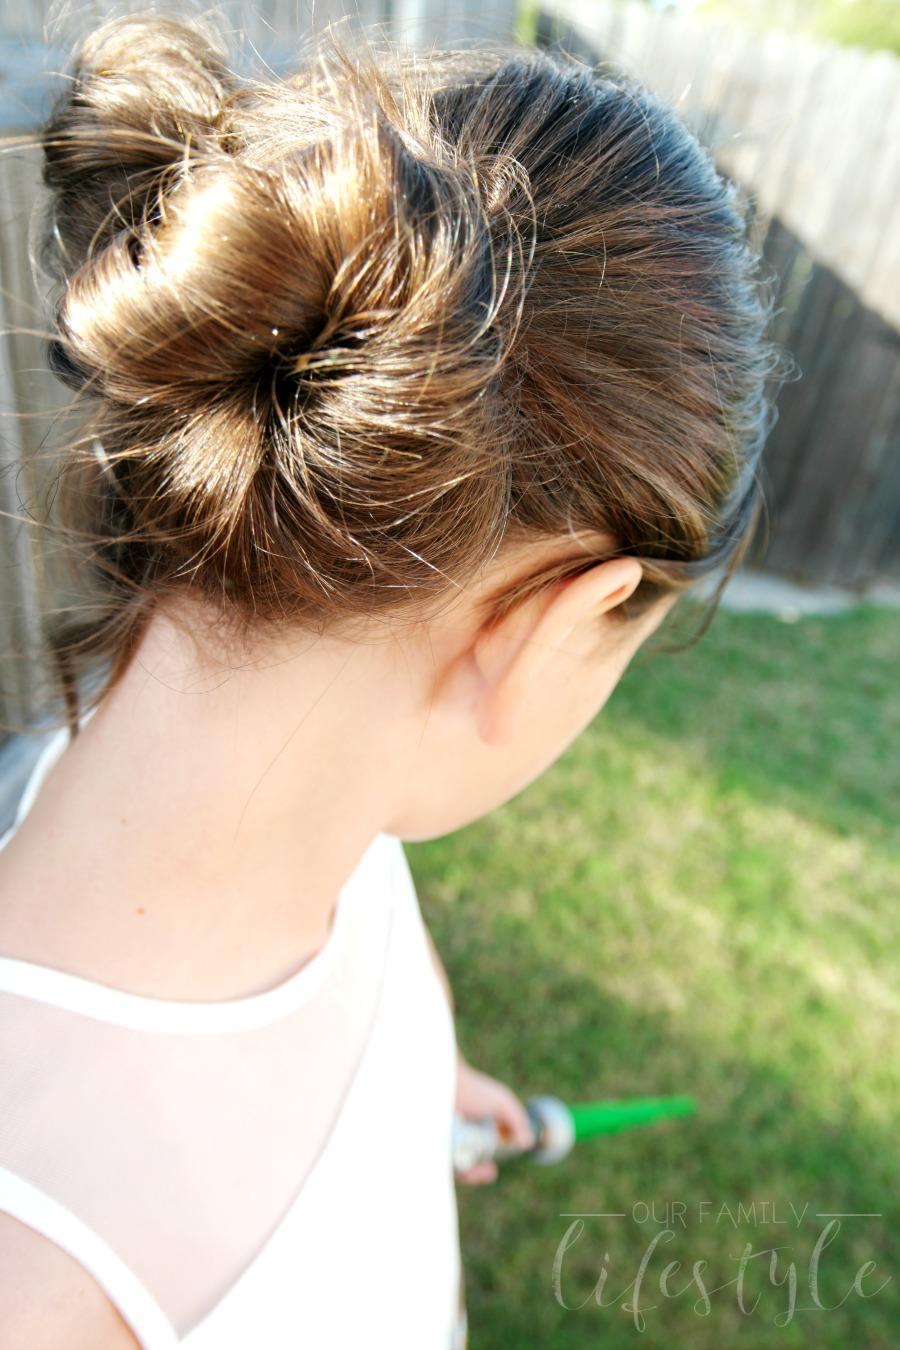 Princess Leia hair buns